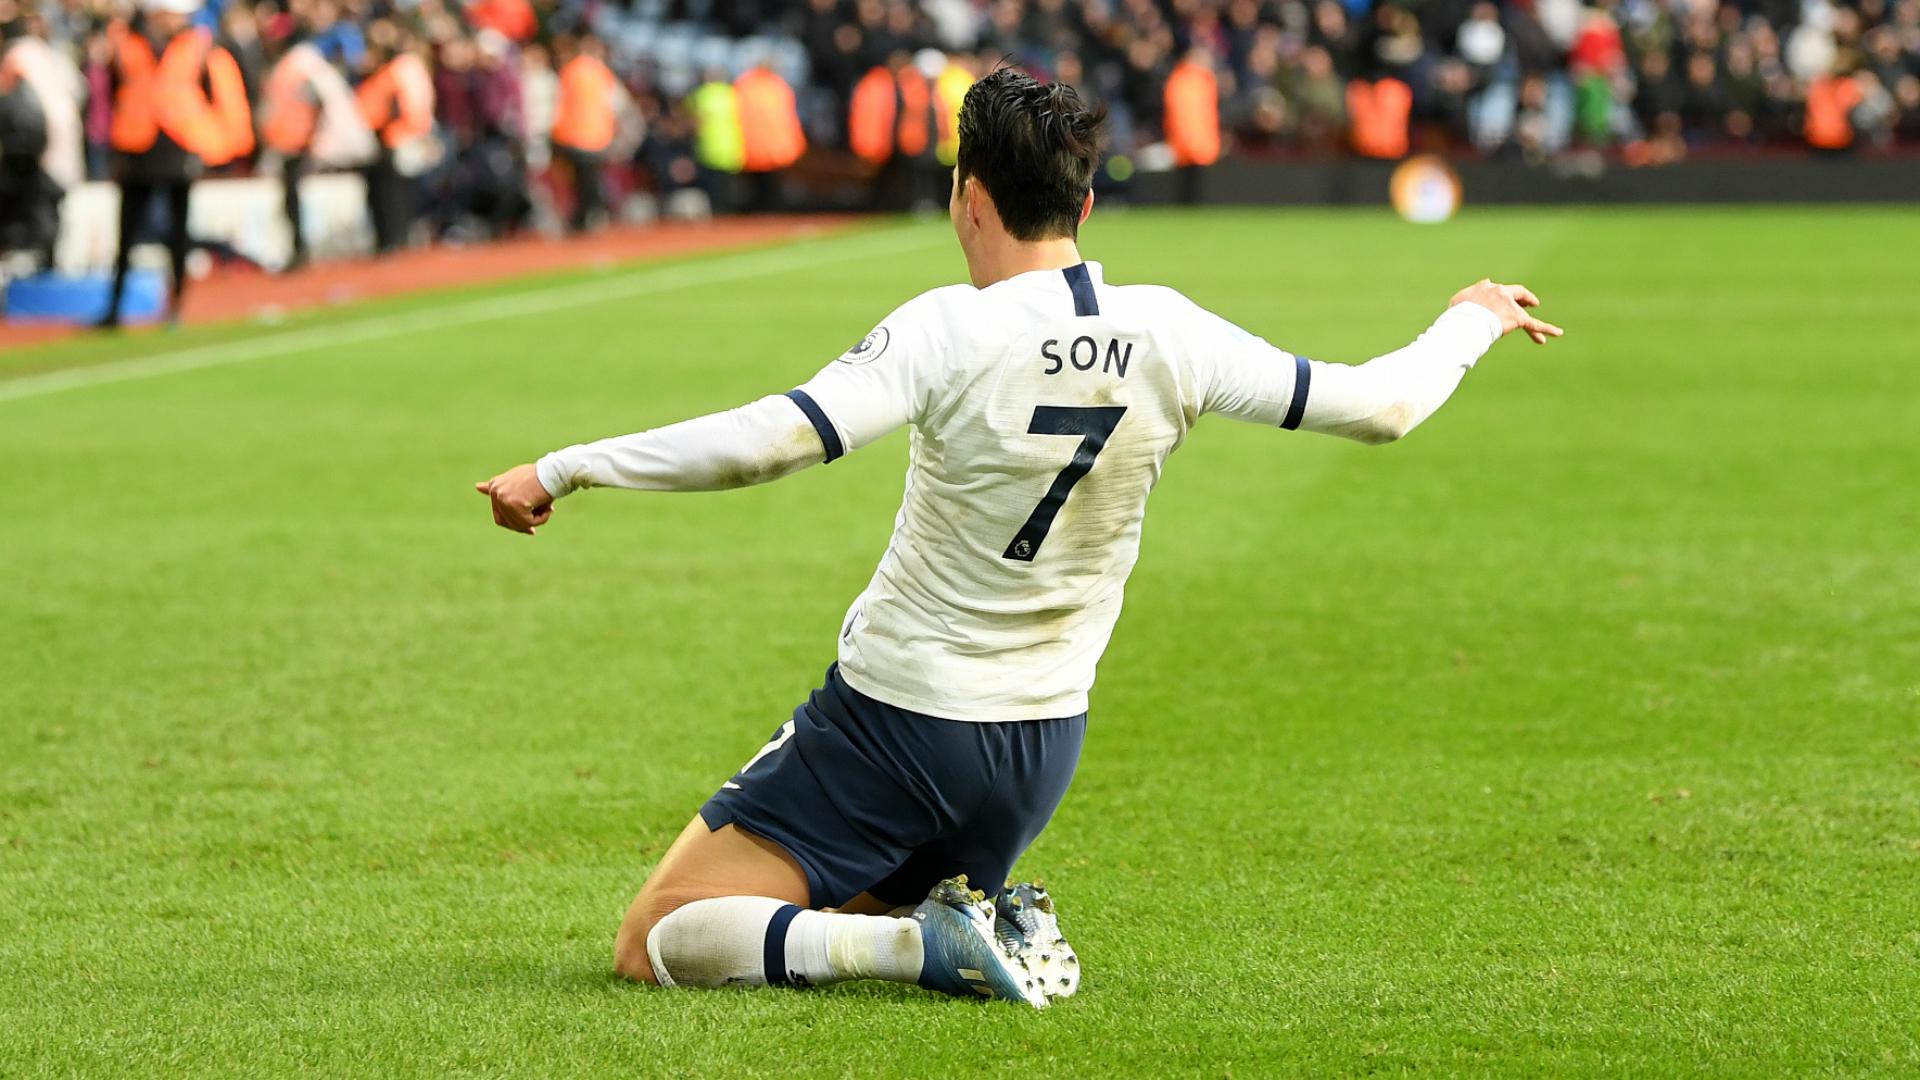 Aston Villa 2-3 Tottenham: Son pounces on Engels error to settle thriller